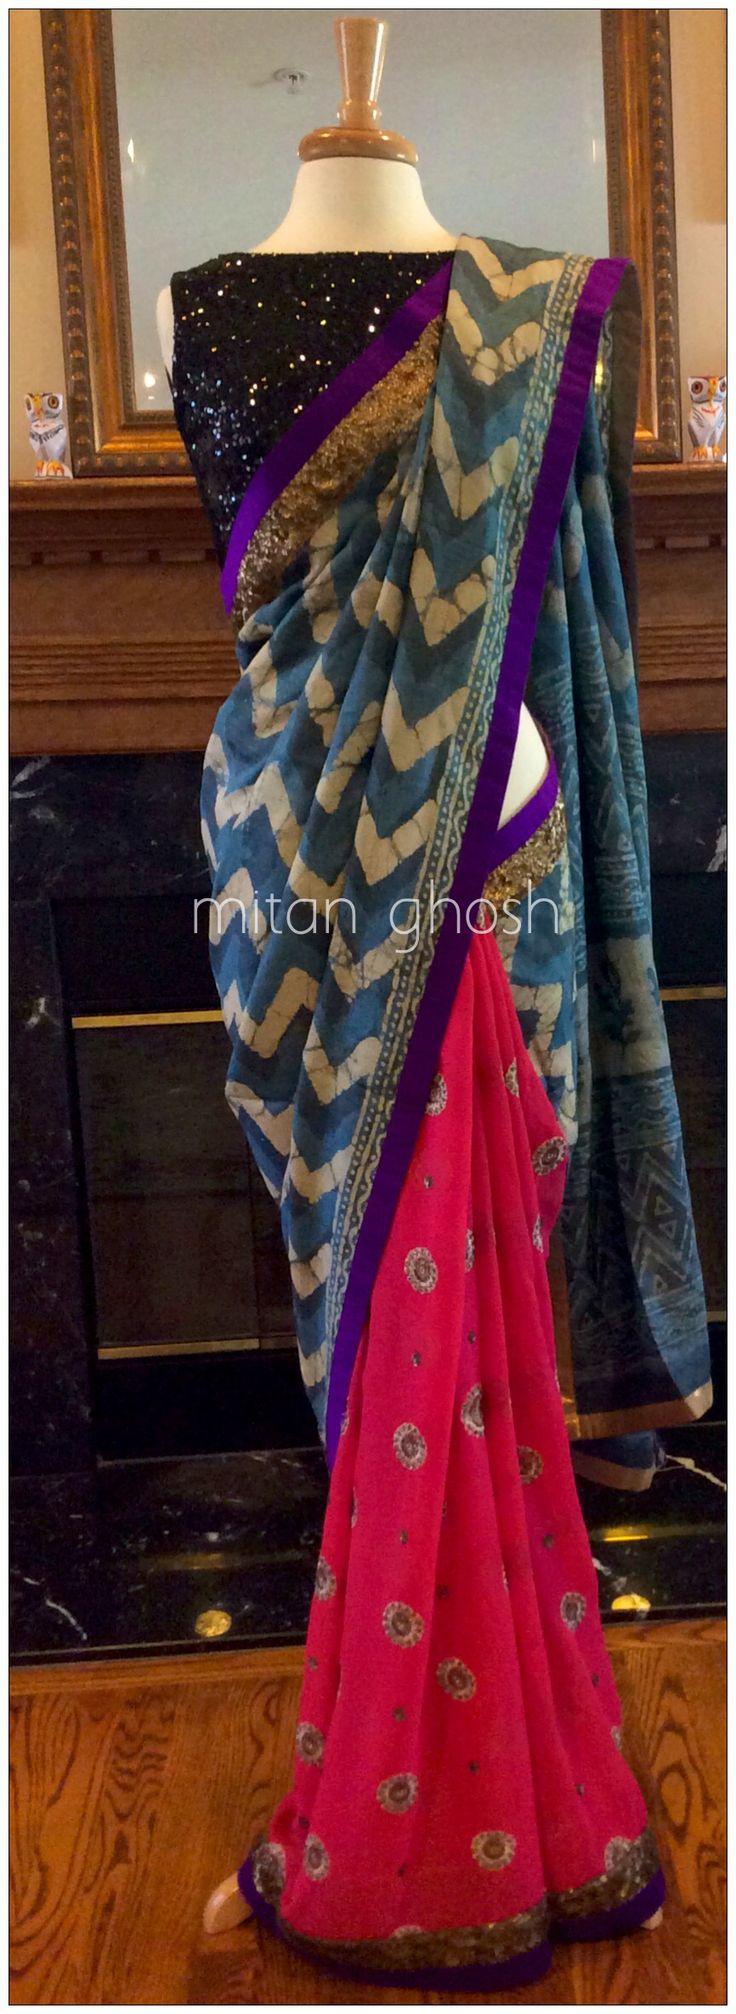 Batik tassar with georgette saree                                                                                                                                                                                 More